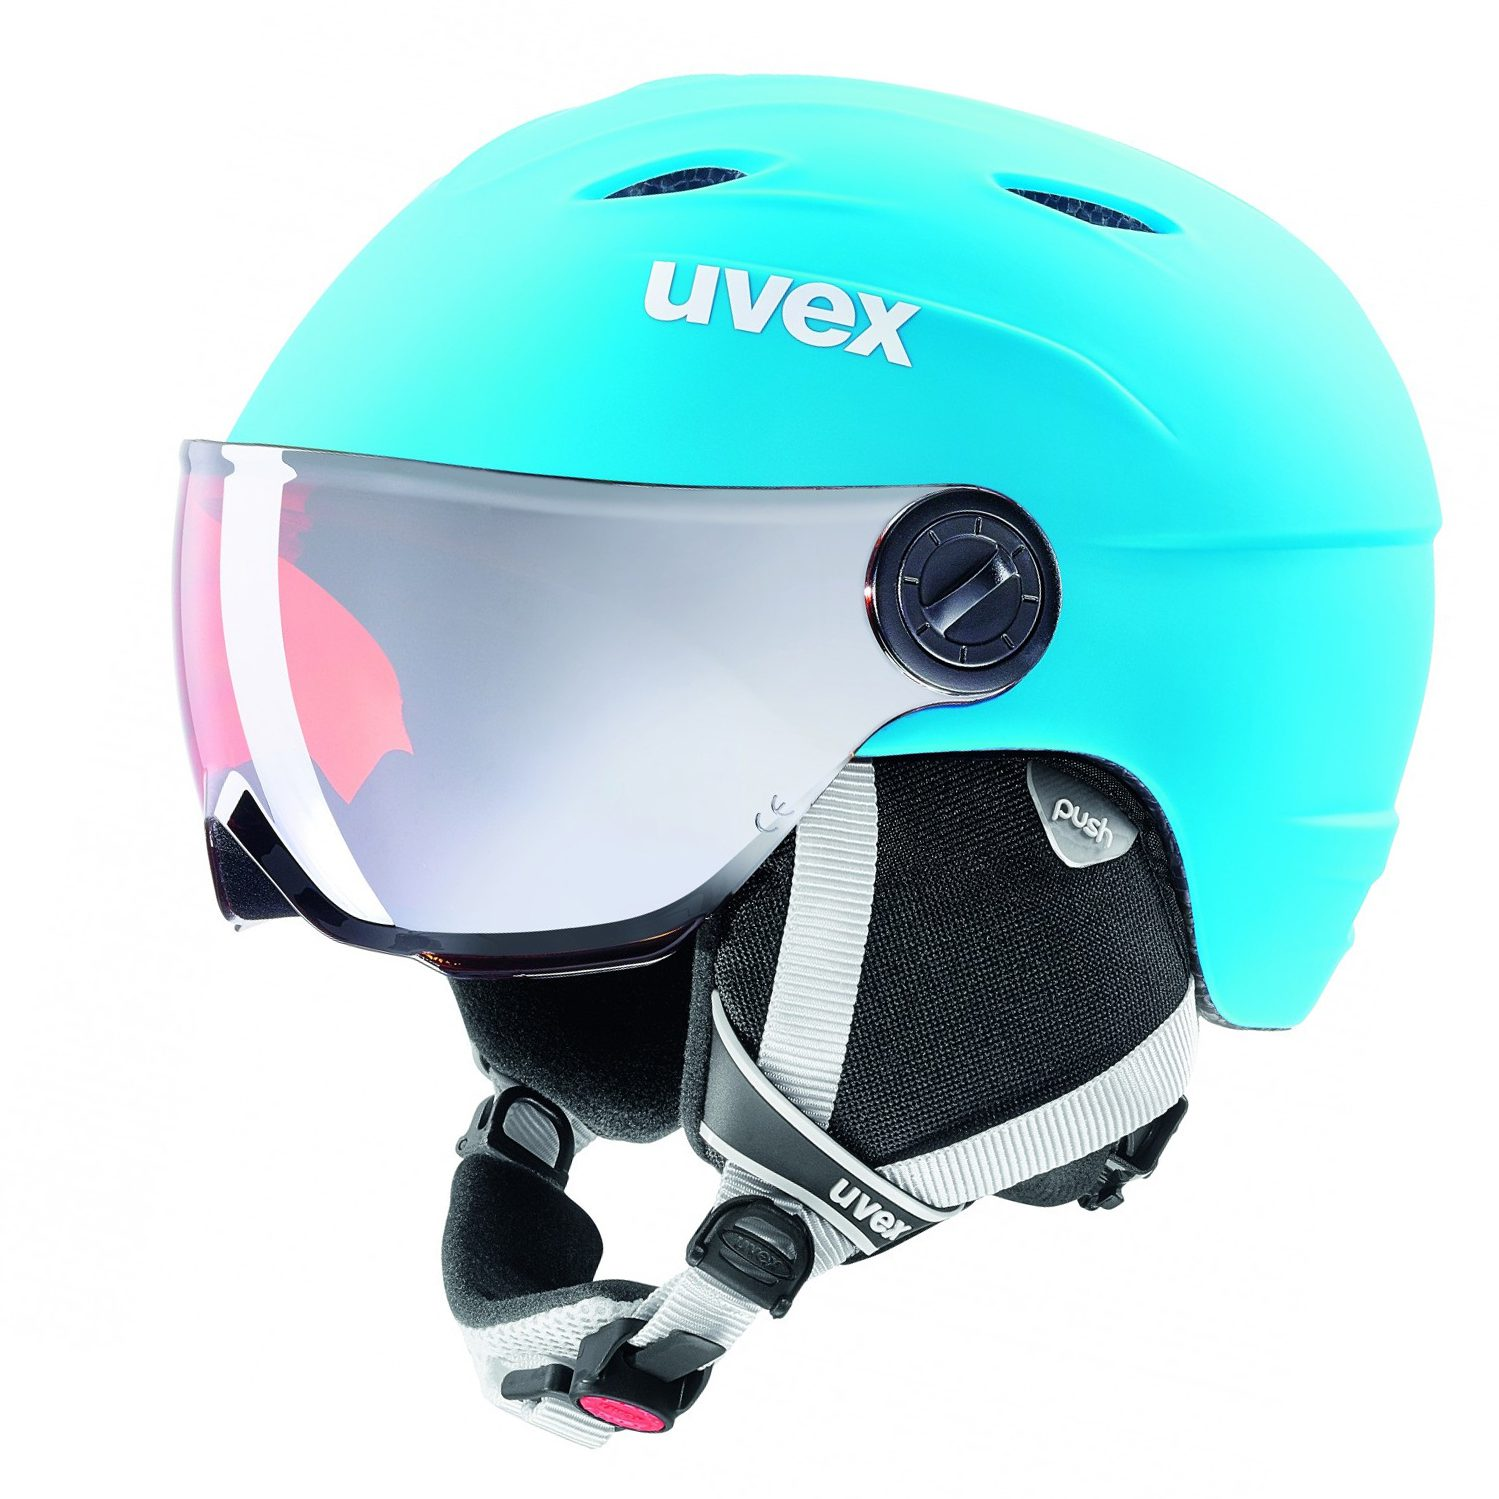 Uvex Junior Visor Pro liteblue white kindervizierhelm